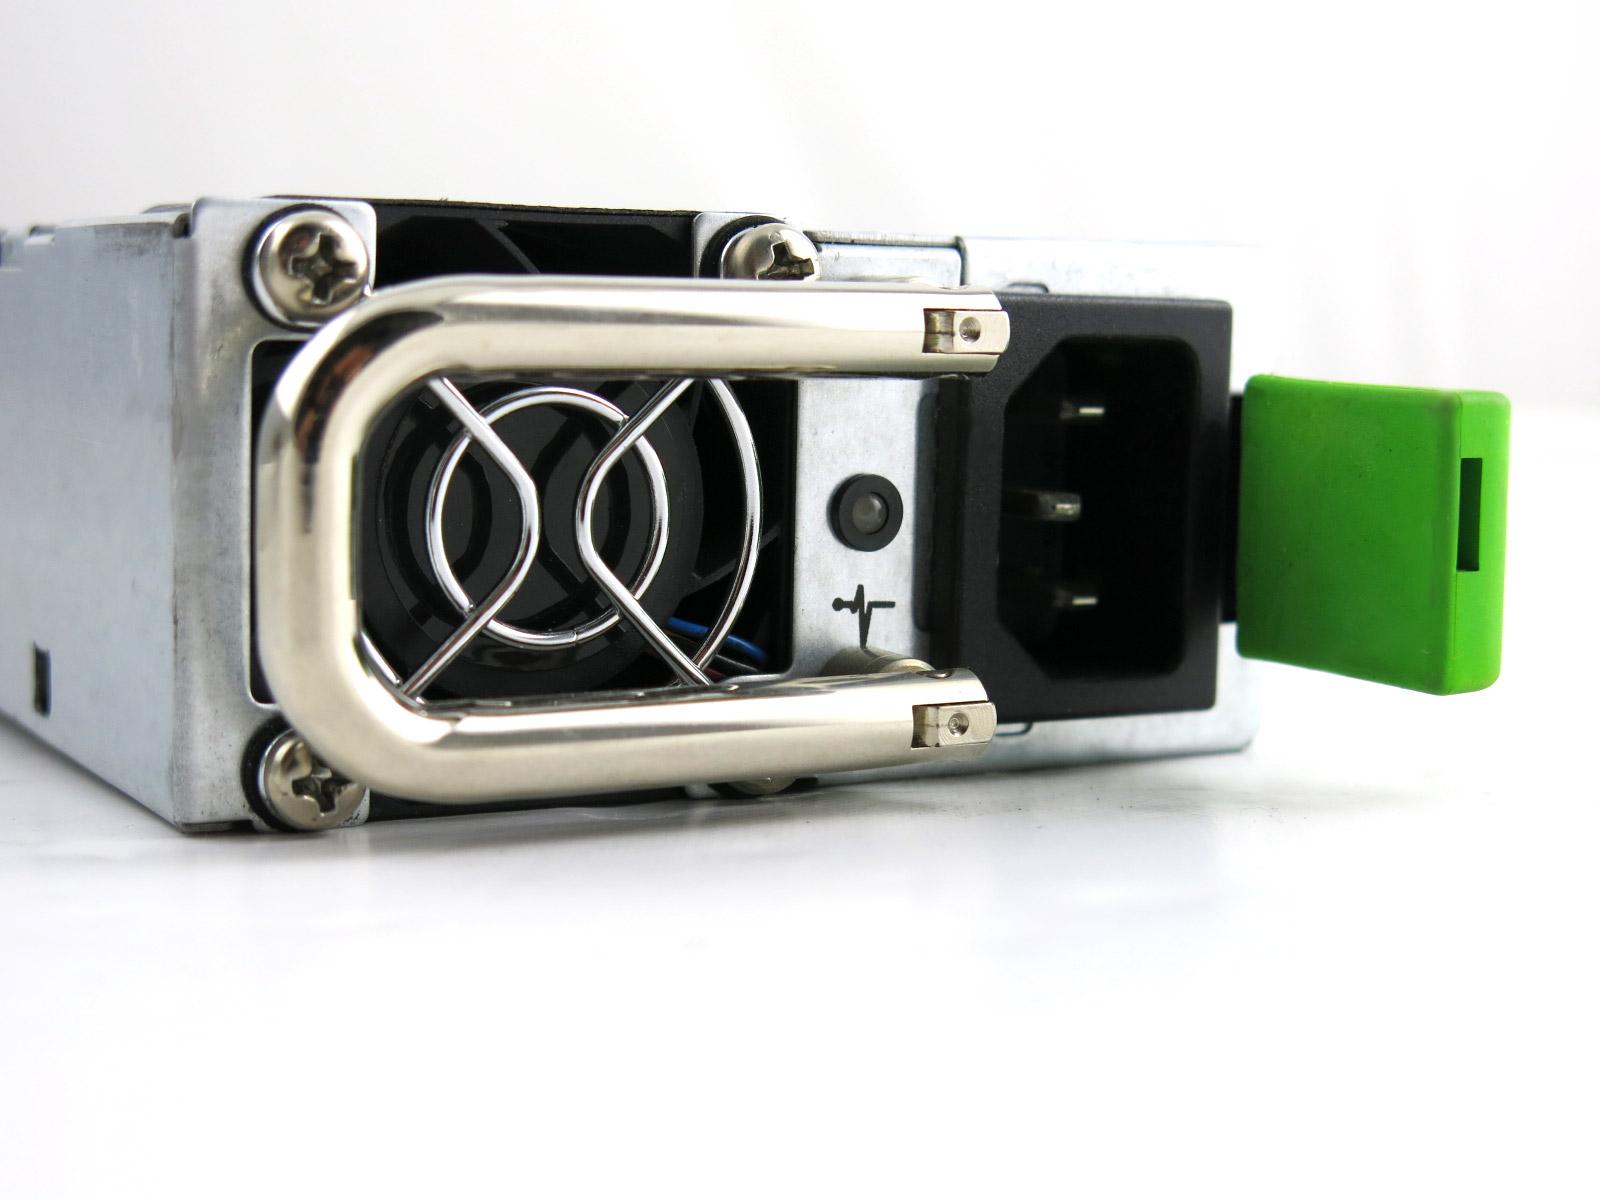 240V input C13 power cord plug